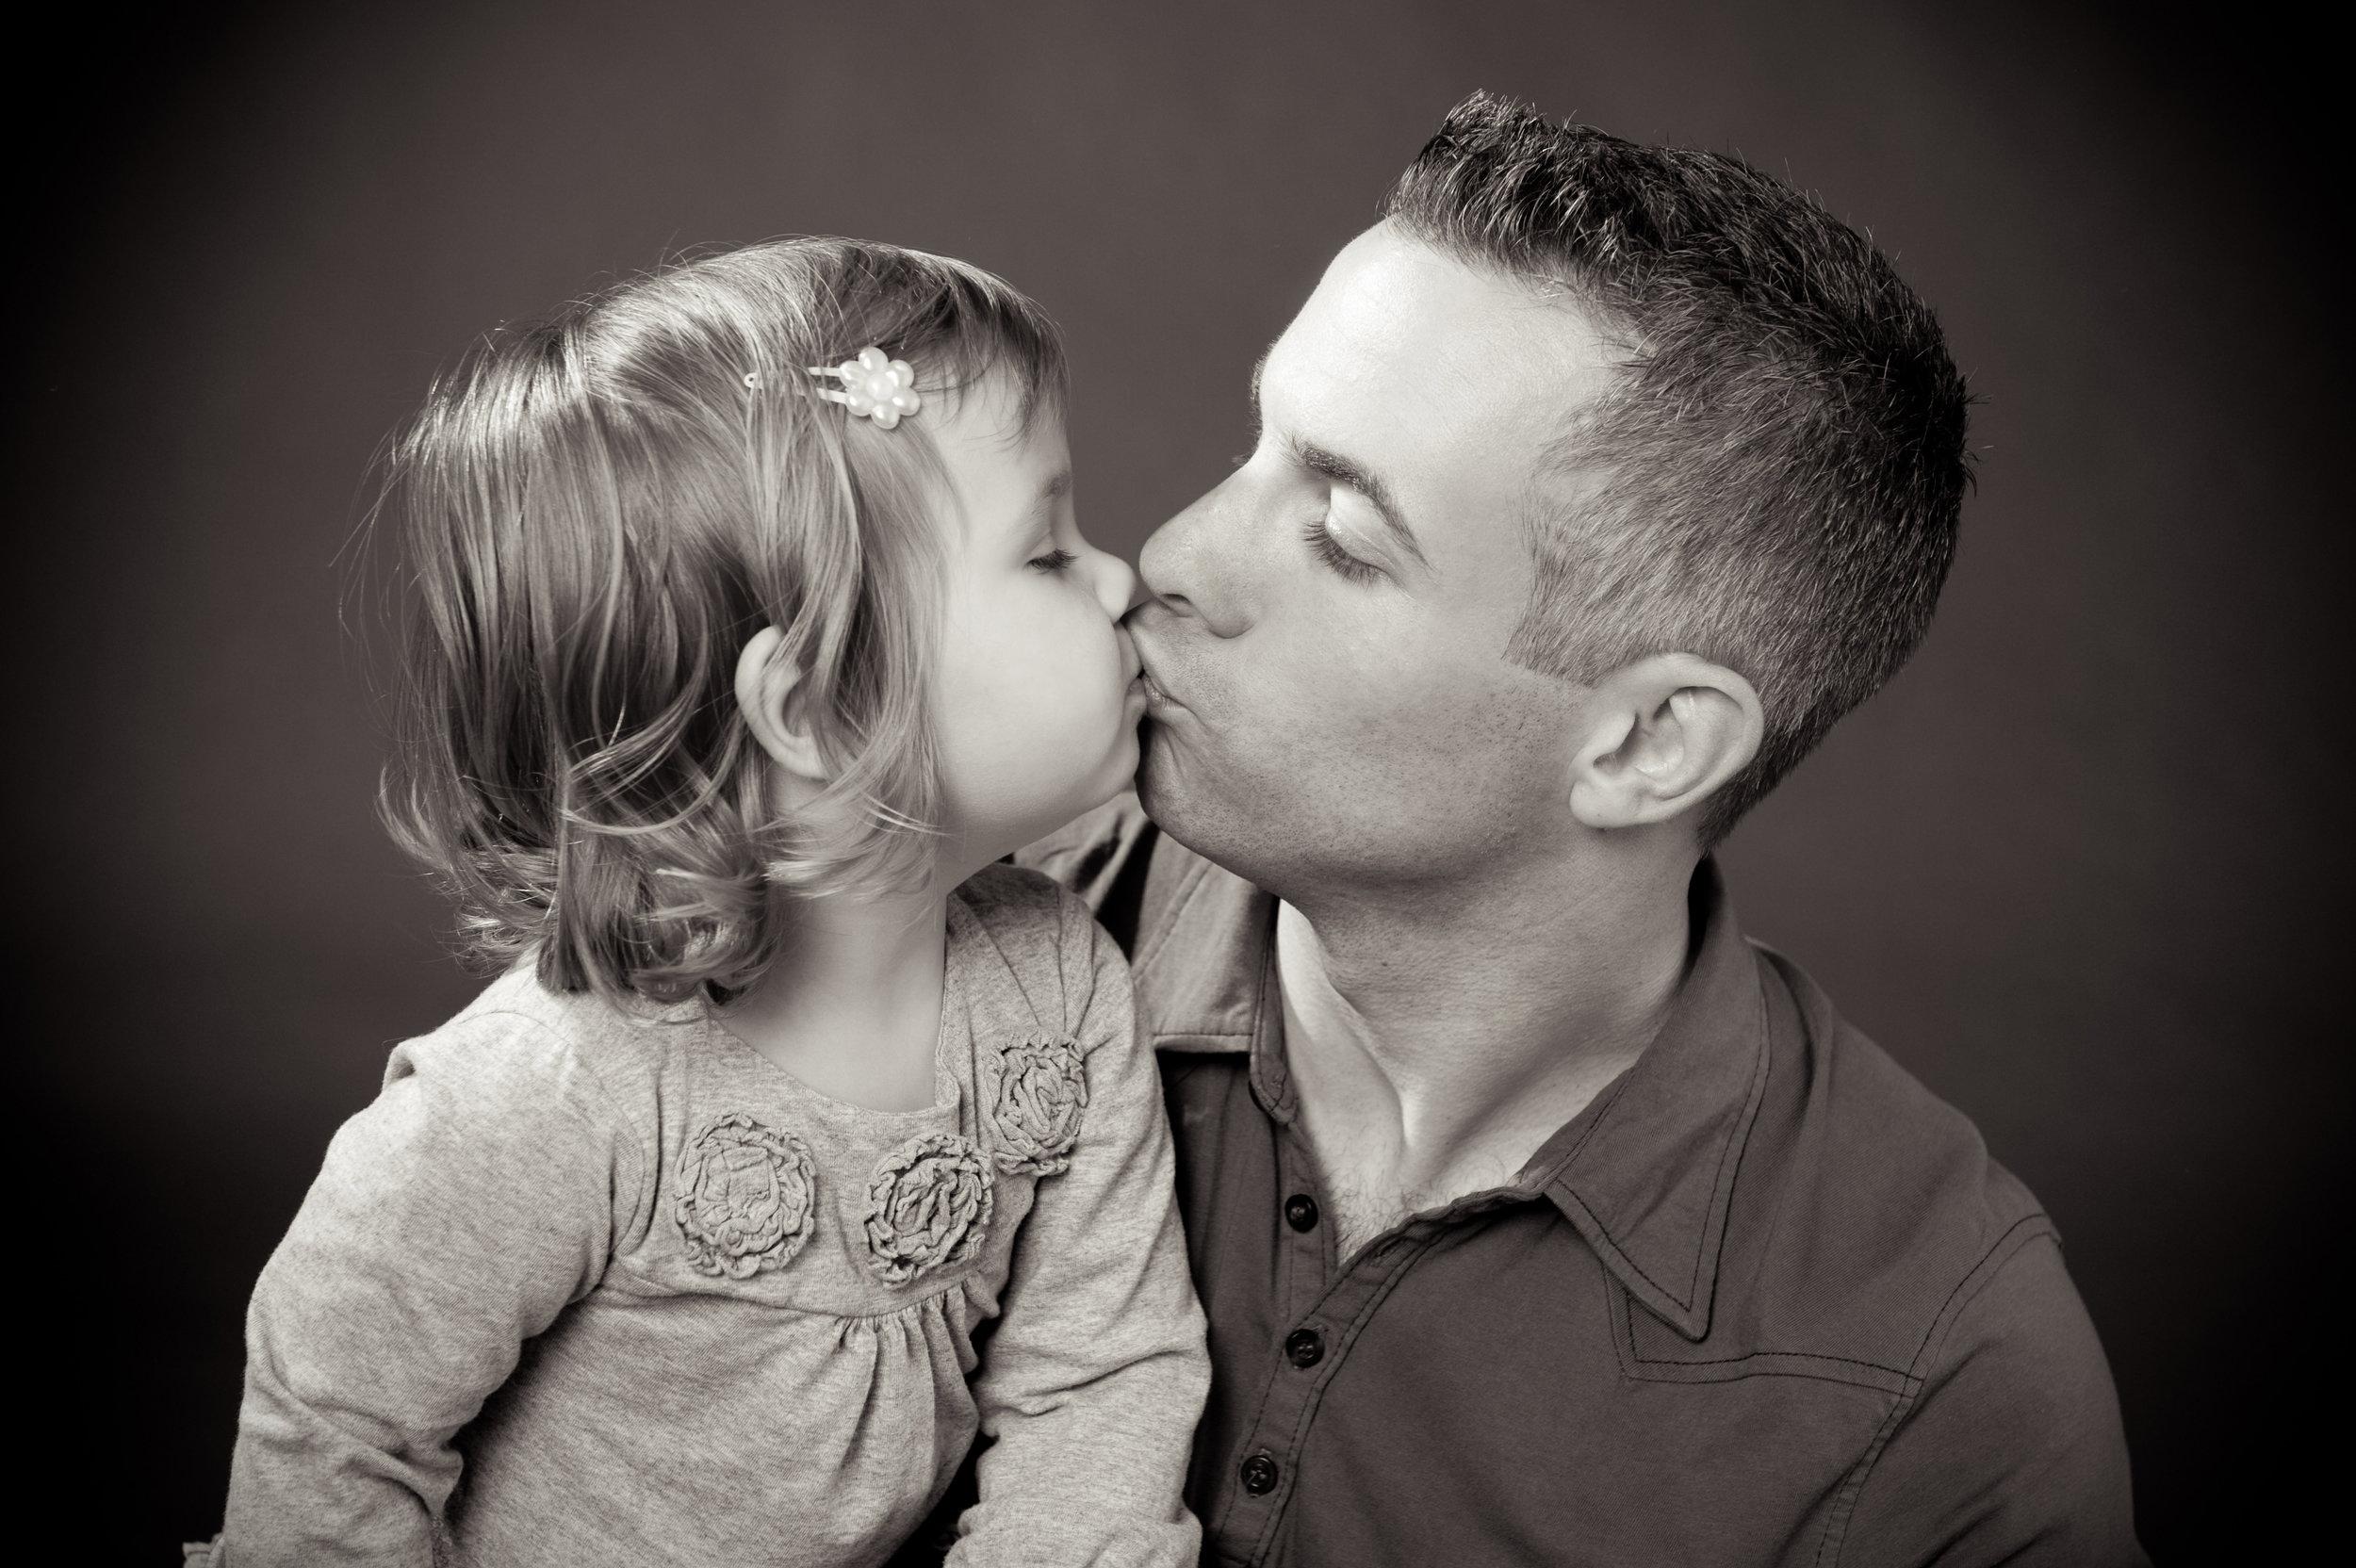 marta hewson - father kissing daughter.jpg